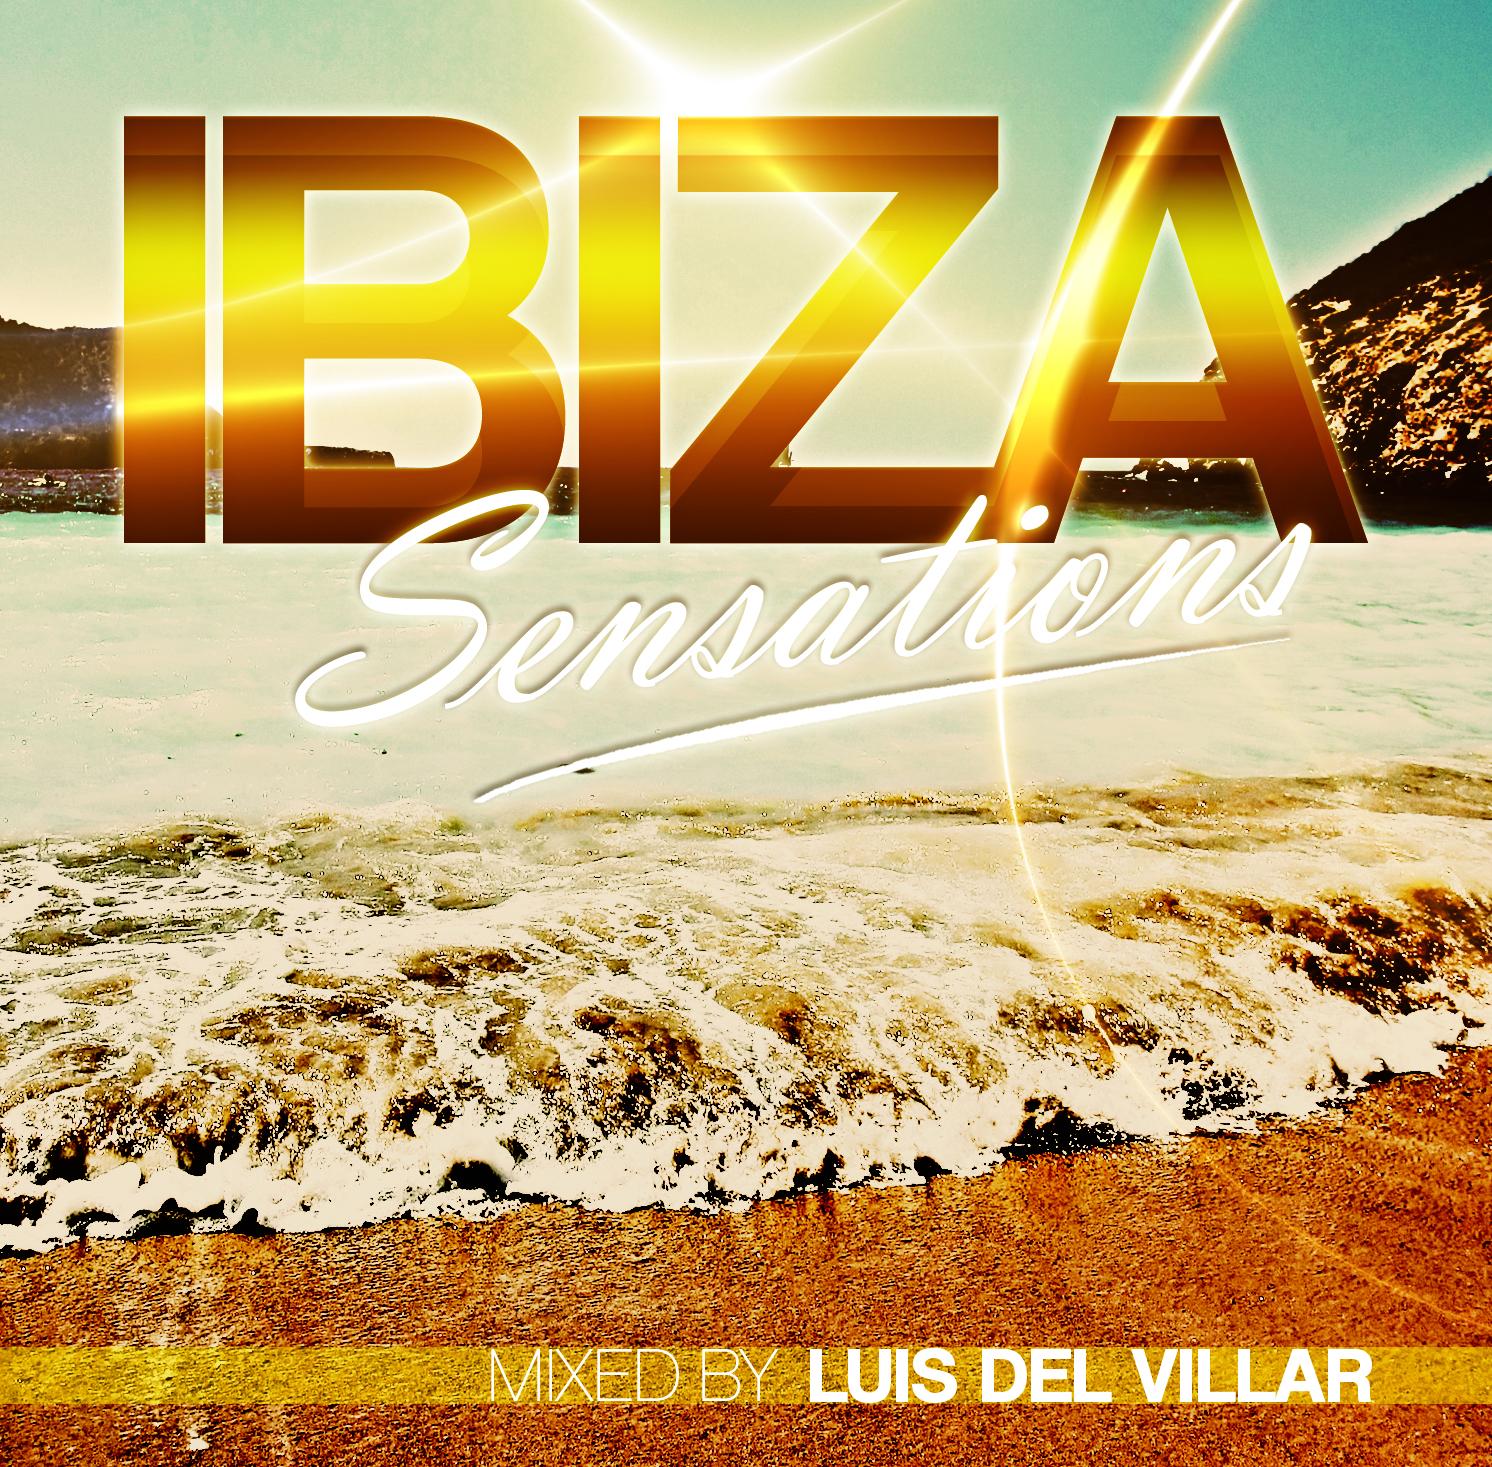 Artwork for Ibiza Sensations 78